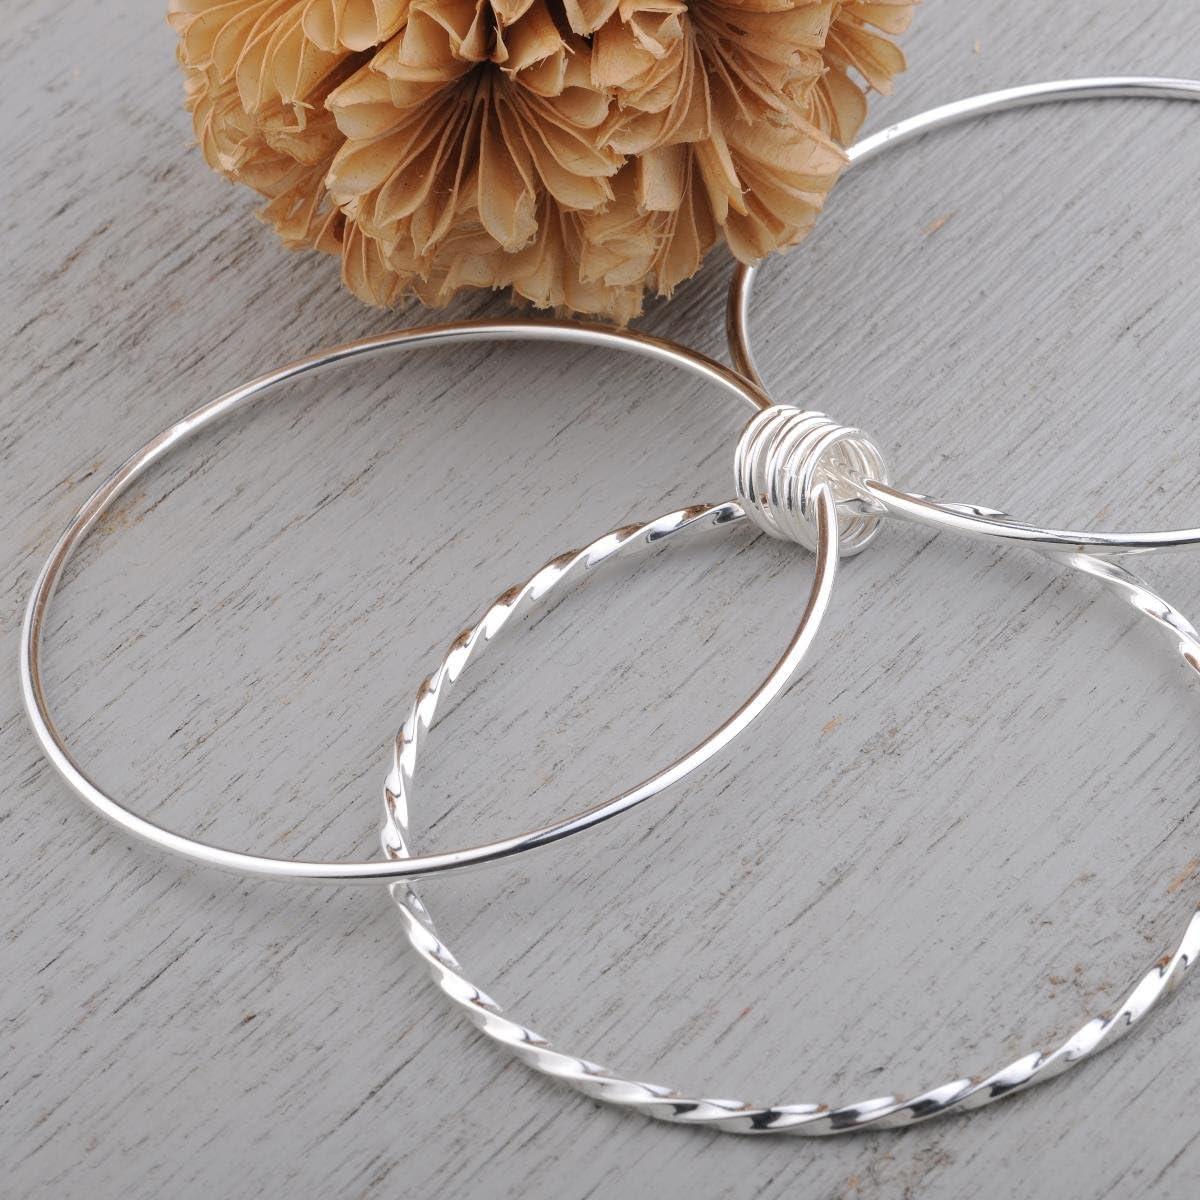 Merdia 925 Sterling Silver Bangle Bracelet with Simple Carved Flower Patterns 6cm